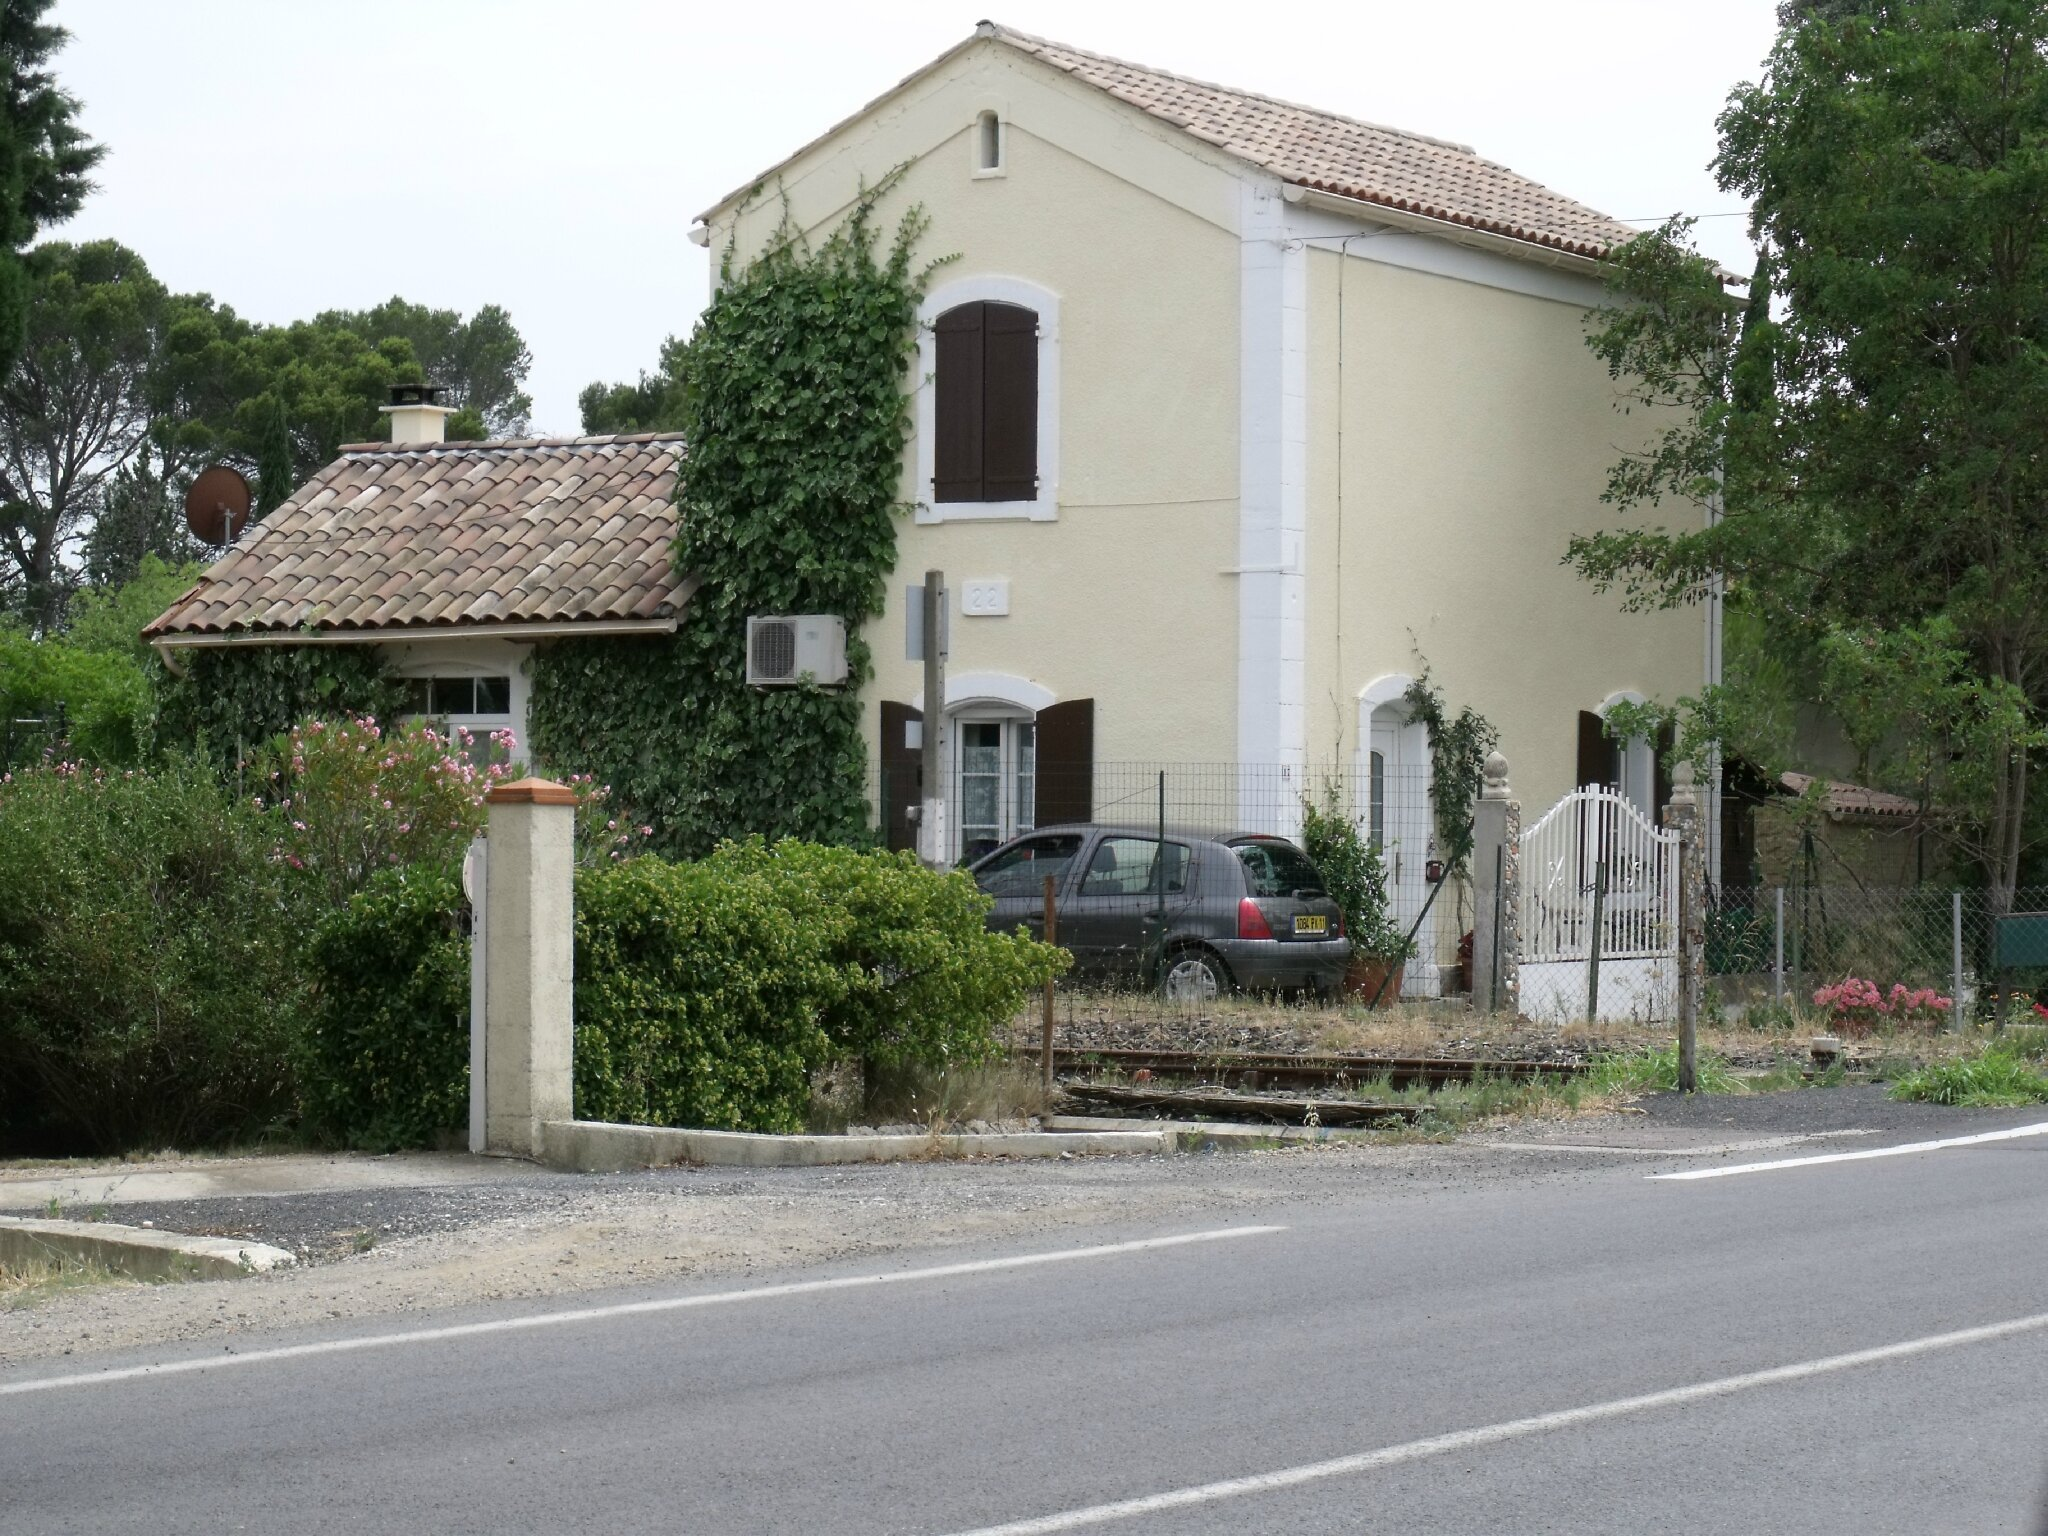 Cabezac (Aude - 11)